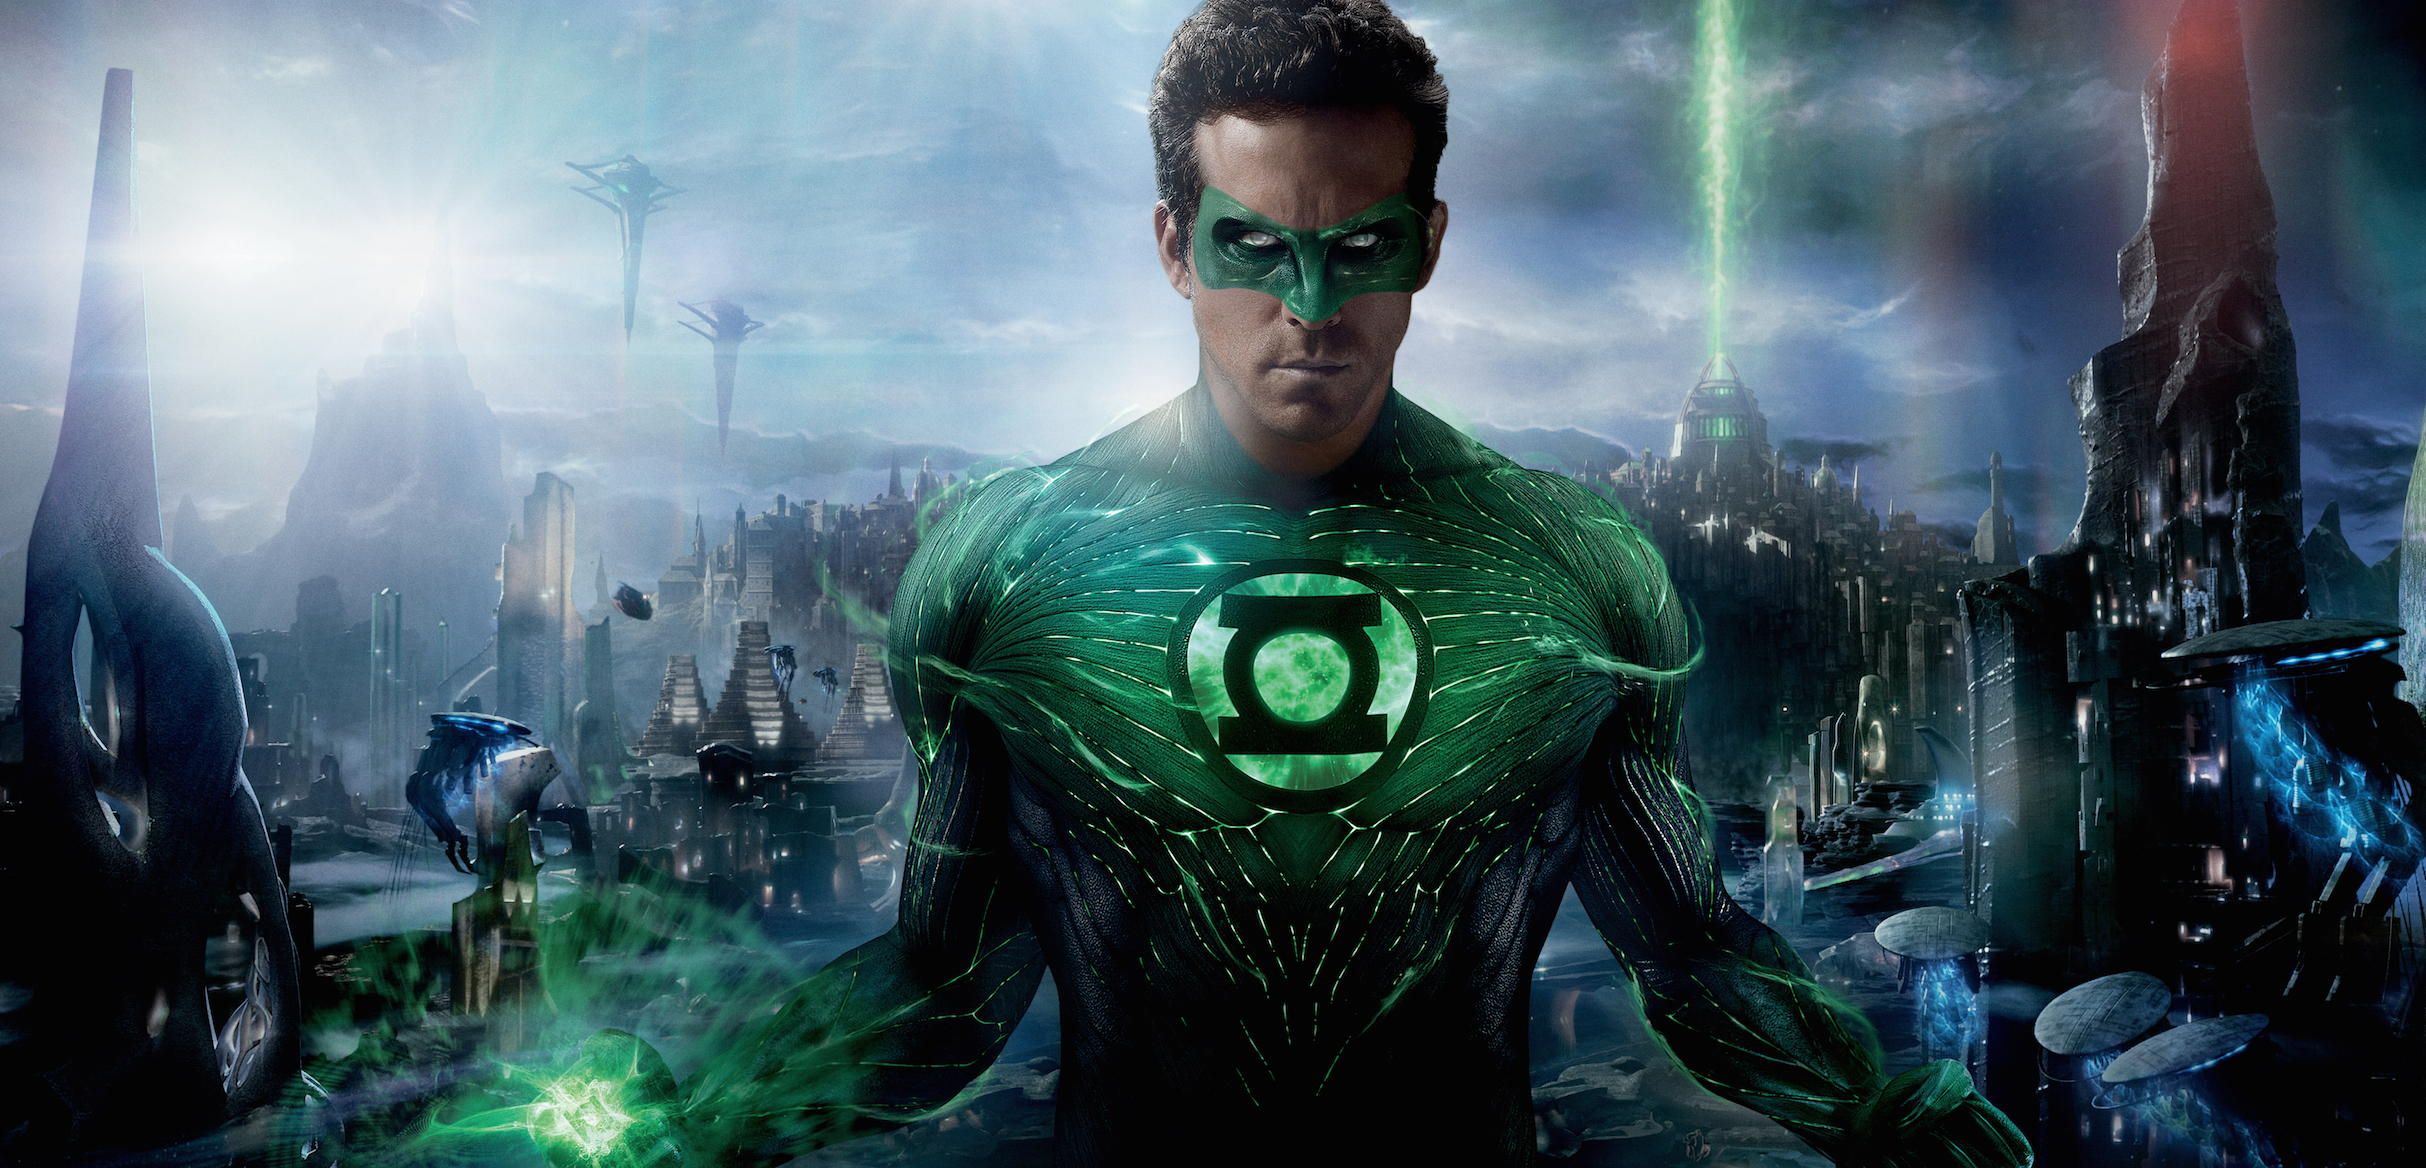 Green-Lantern-film-1